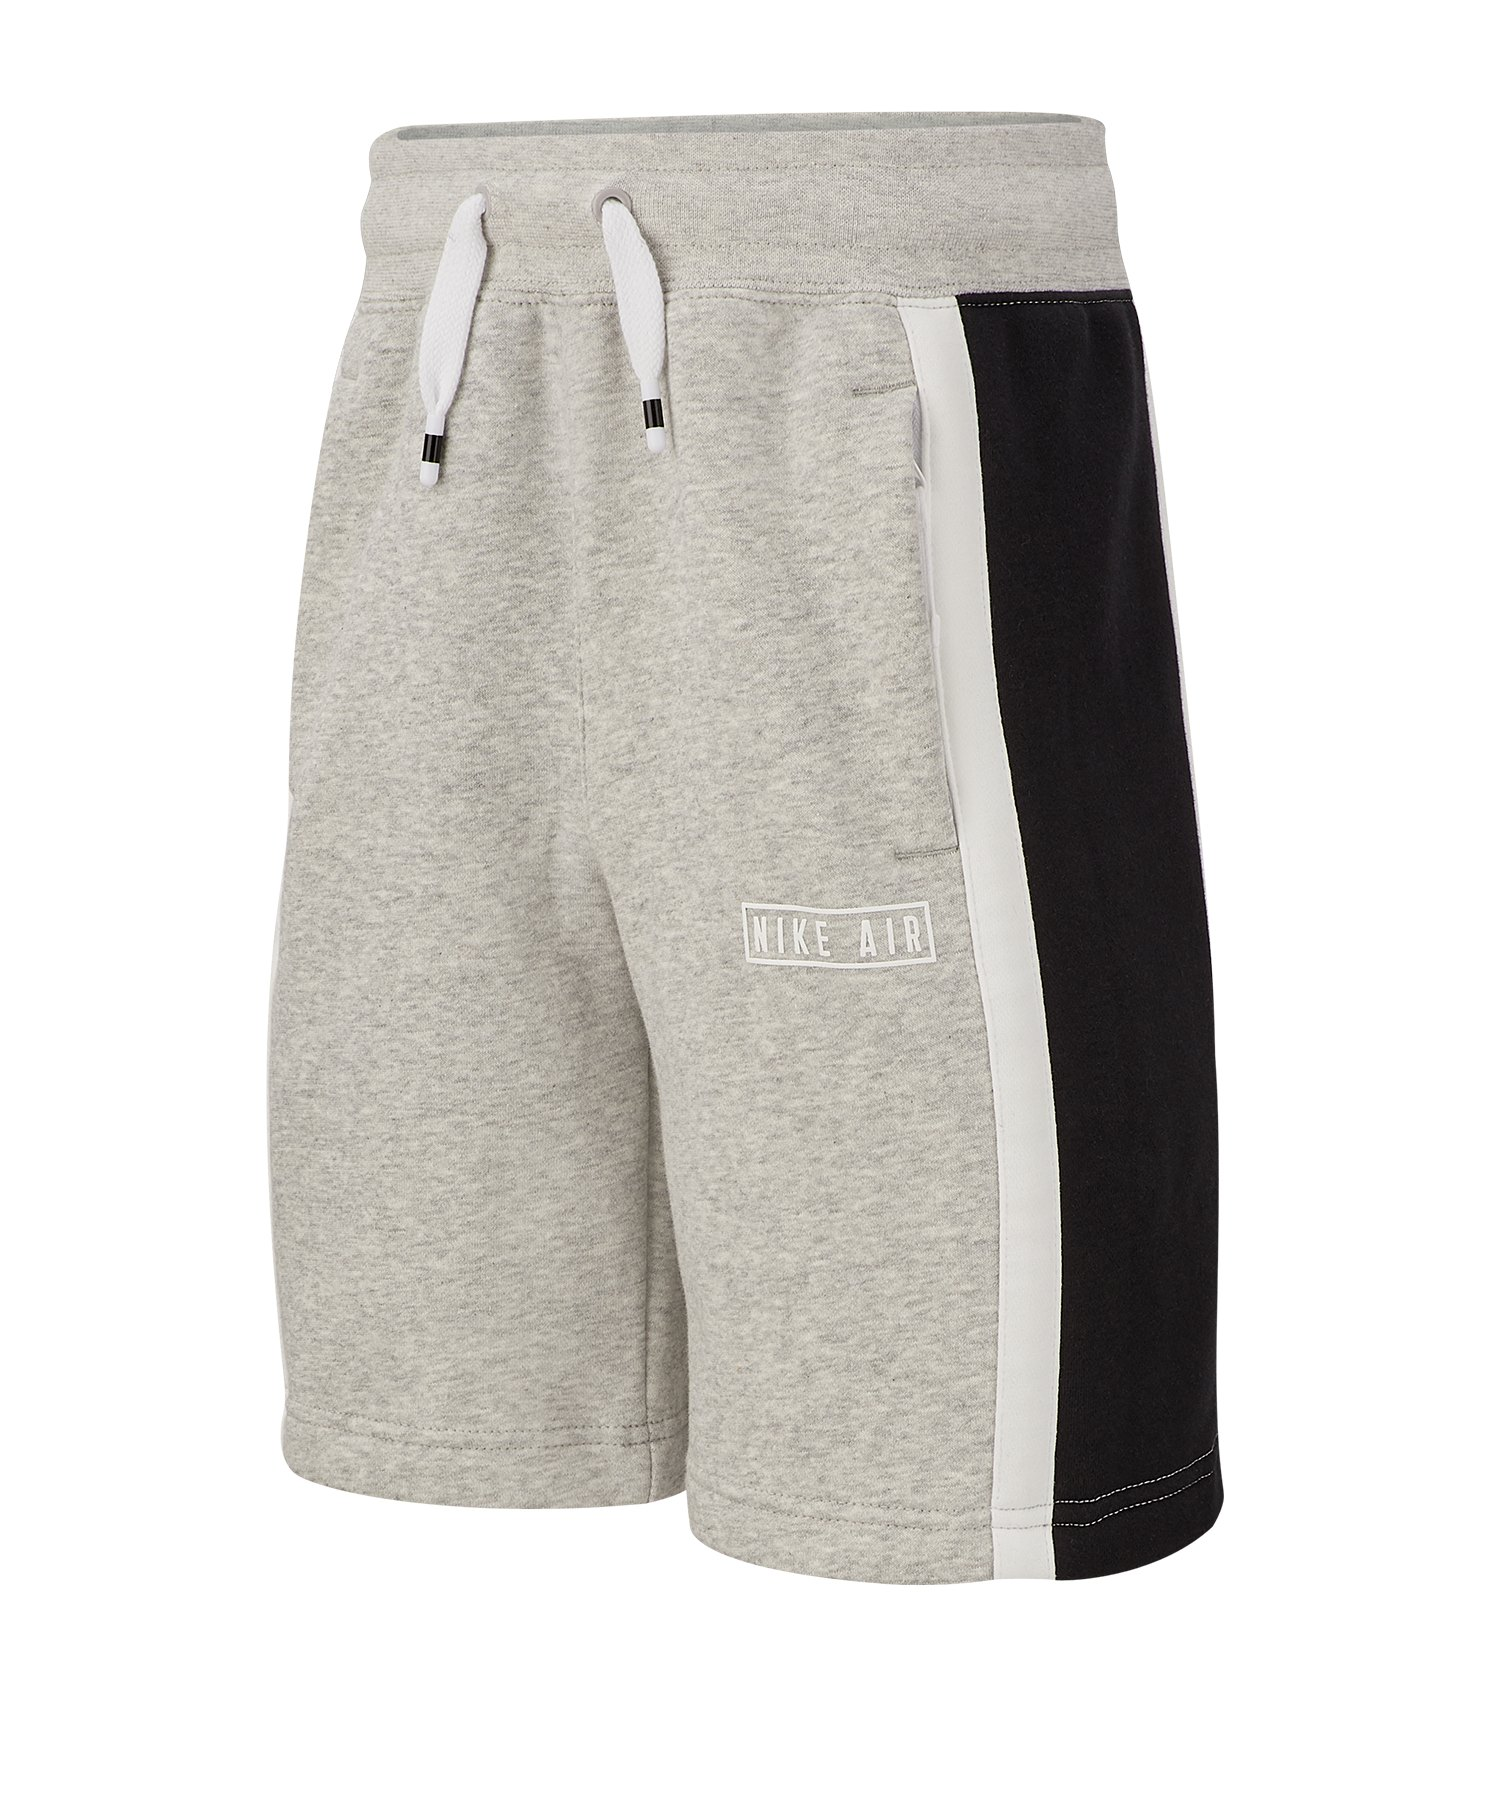 Nike Air Casual Short Kids Grau F050 - grau